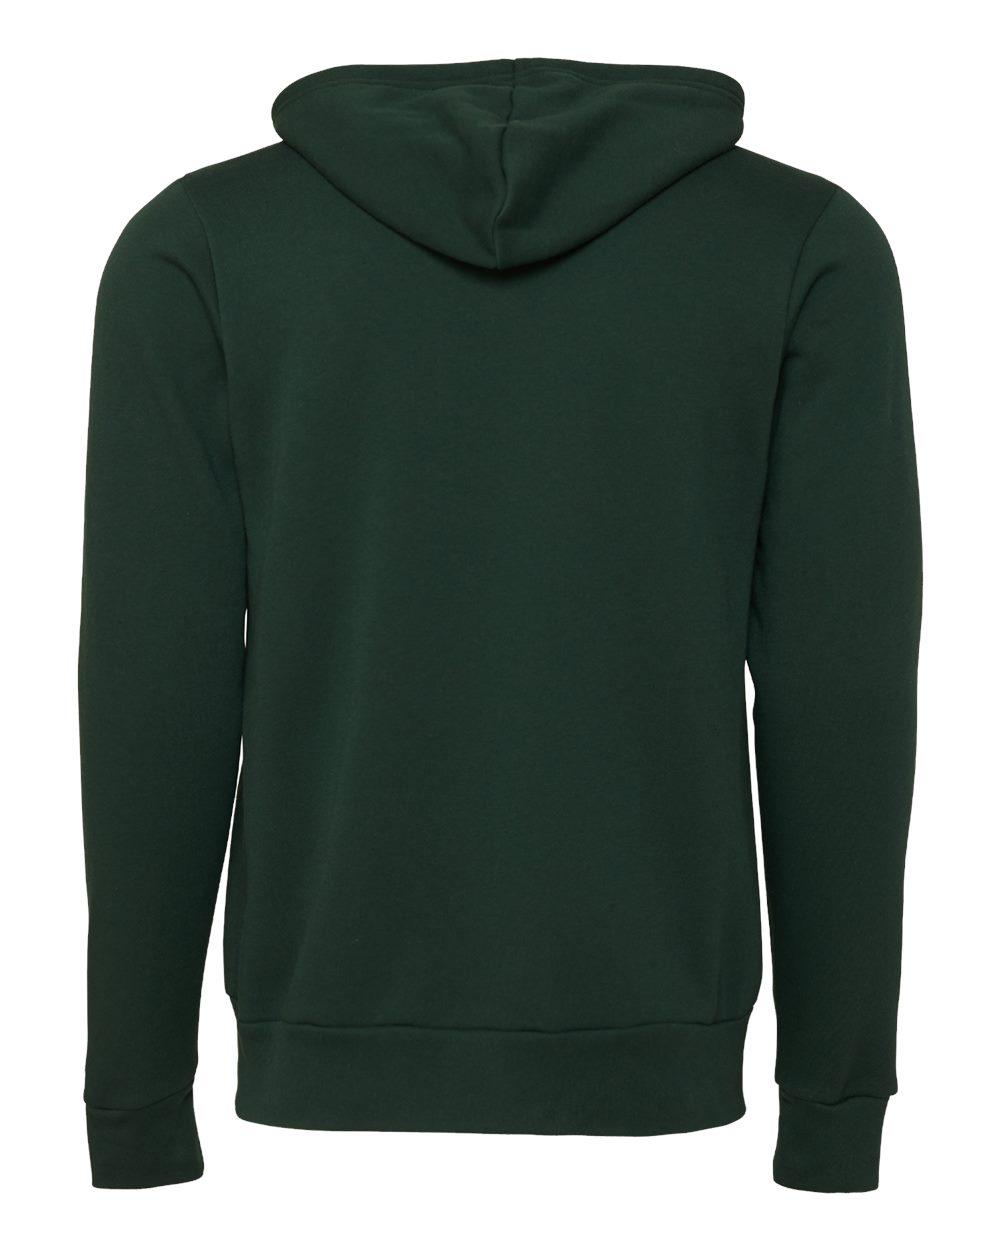 Bella-Canvas-Unisex-Full-Zip-Up-Hooded-Sweatshirt-Blank-Hoodie-3739-up-to-3XL thumbnail 31